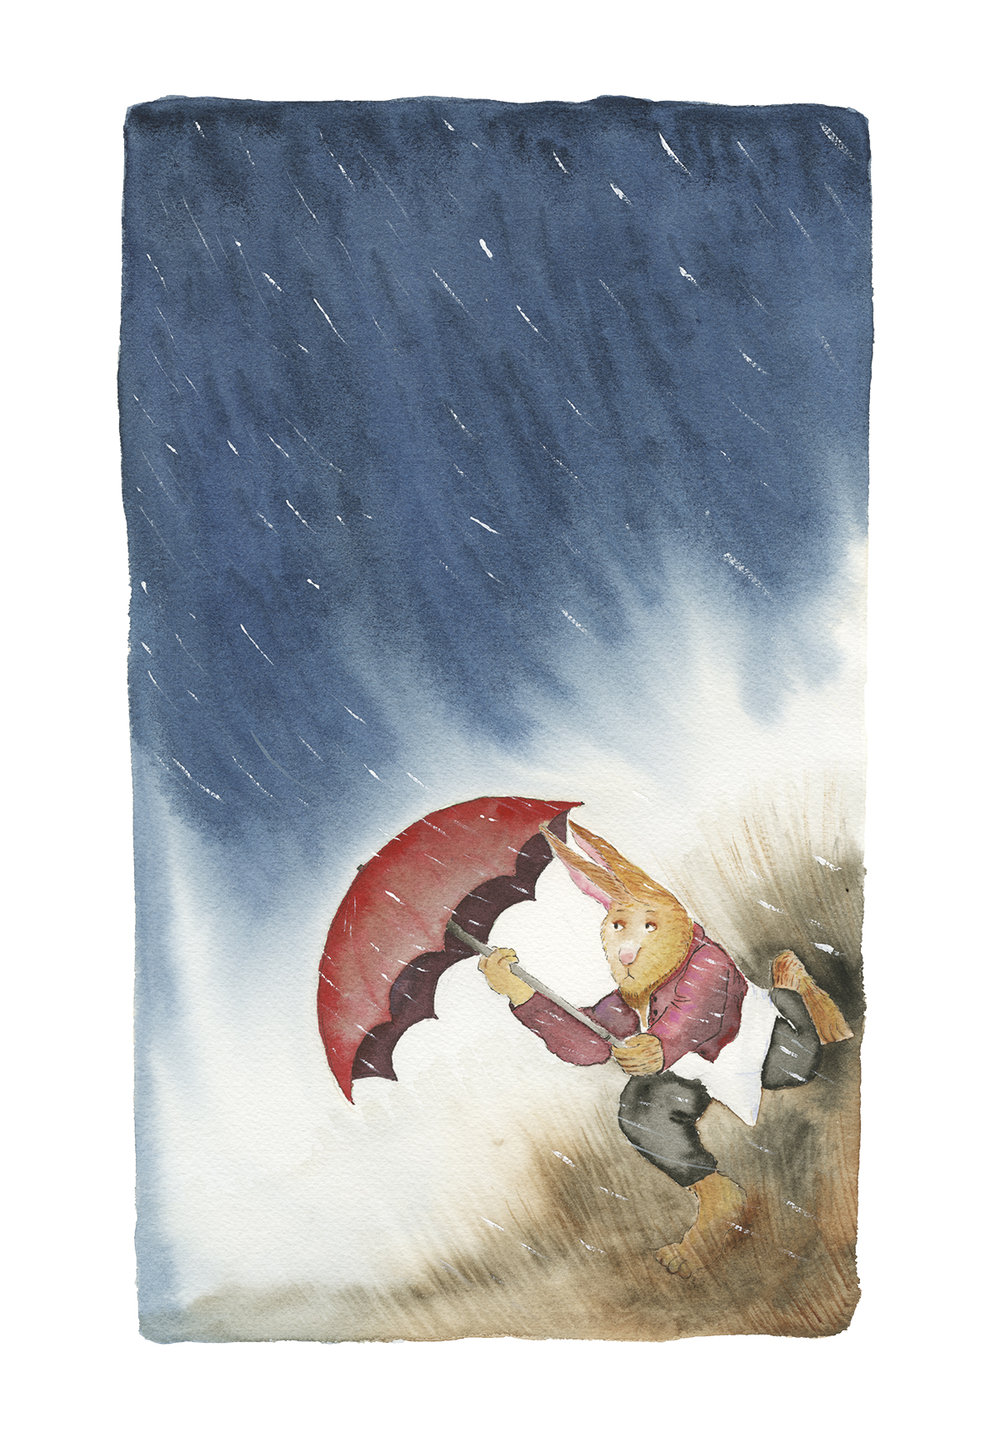 Run Rabbit Rain!